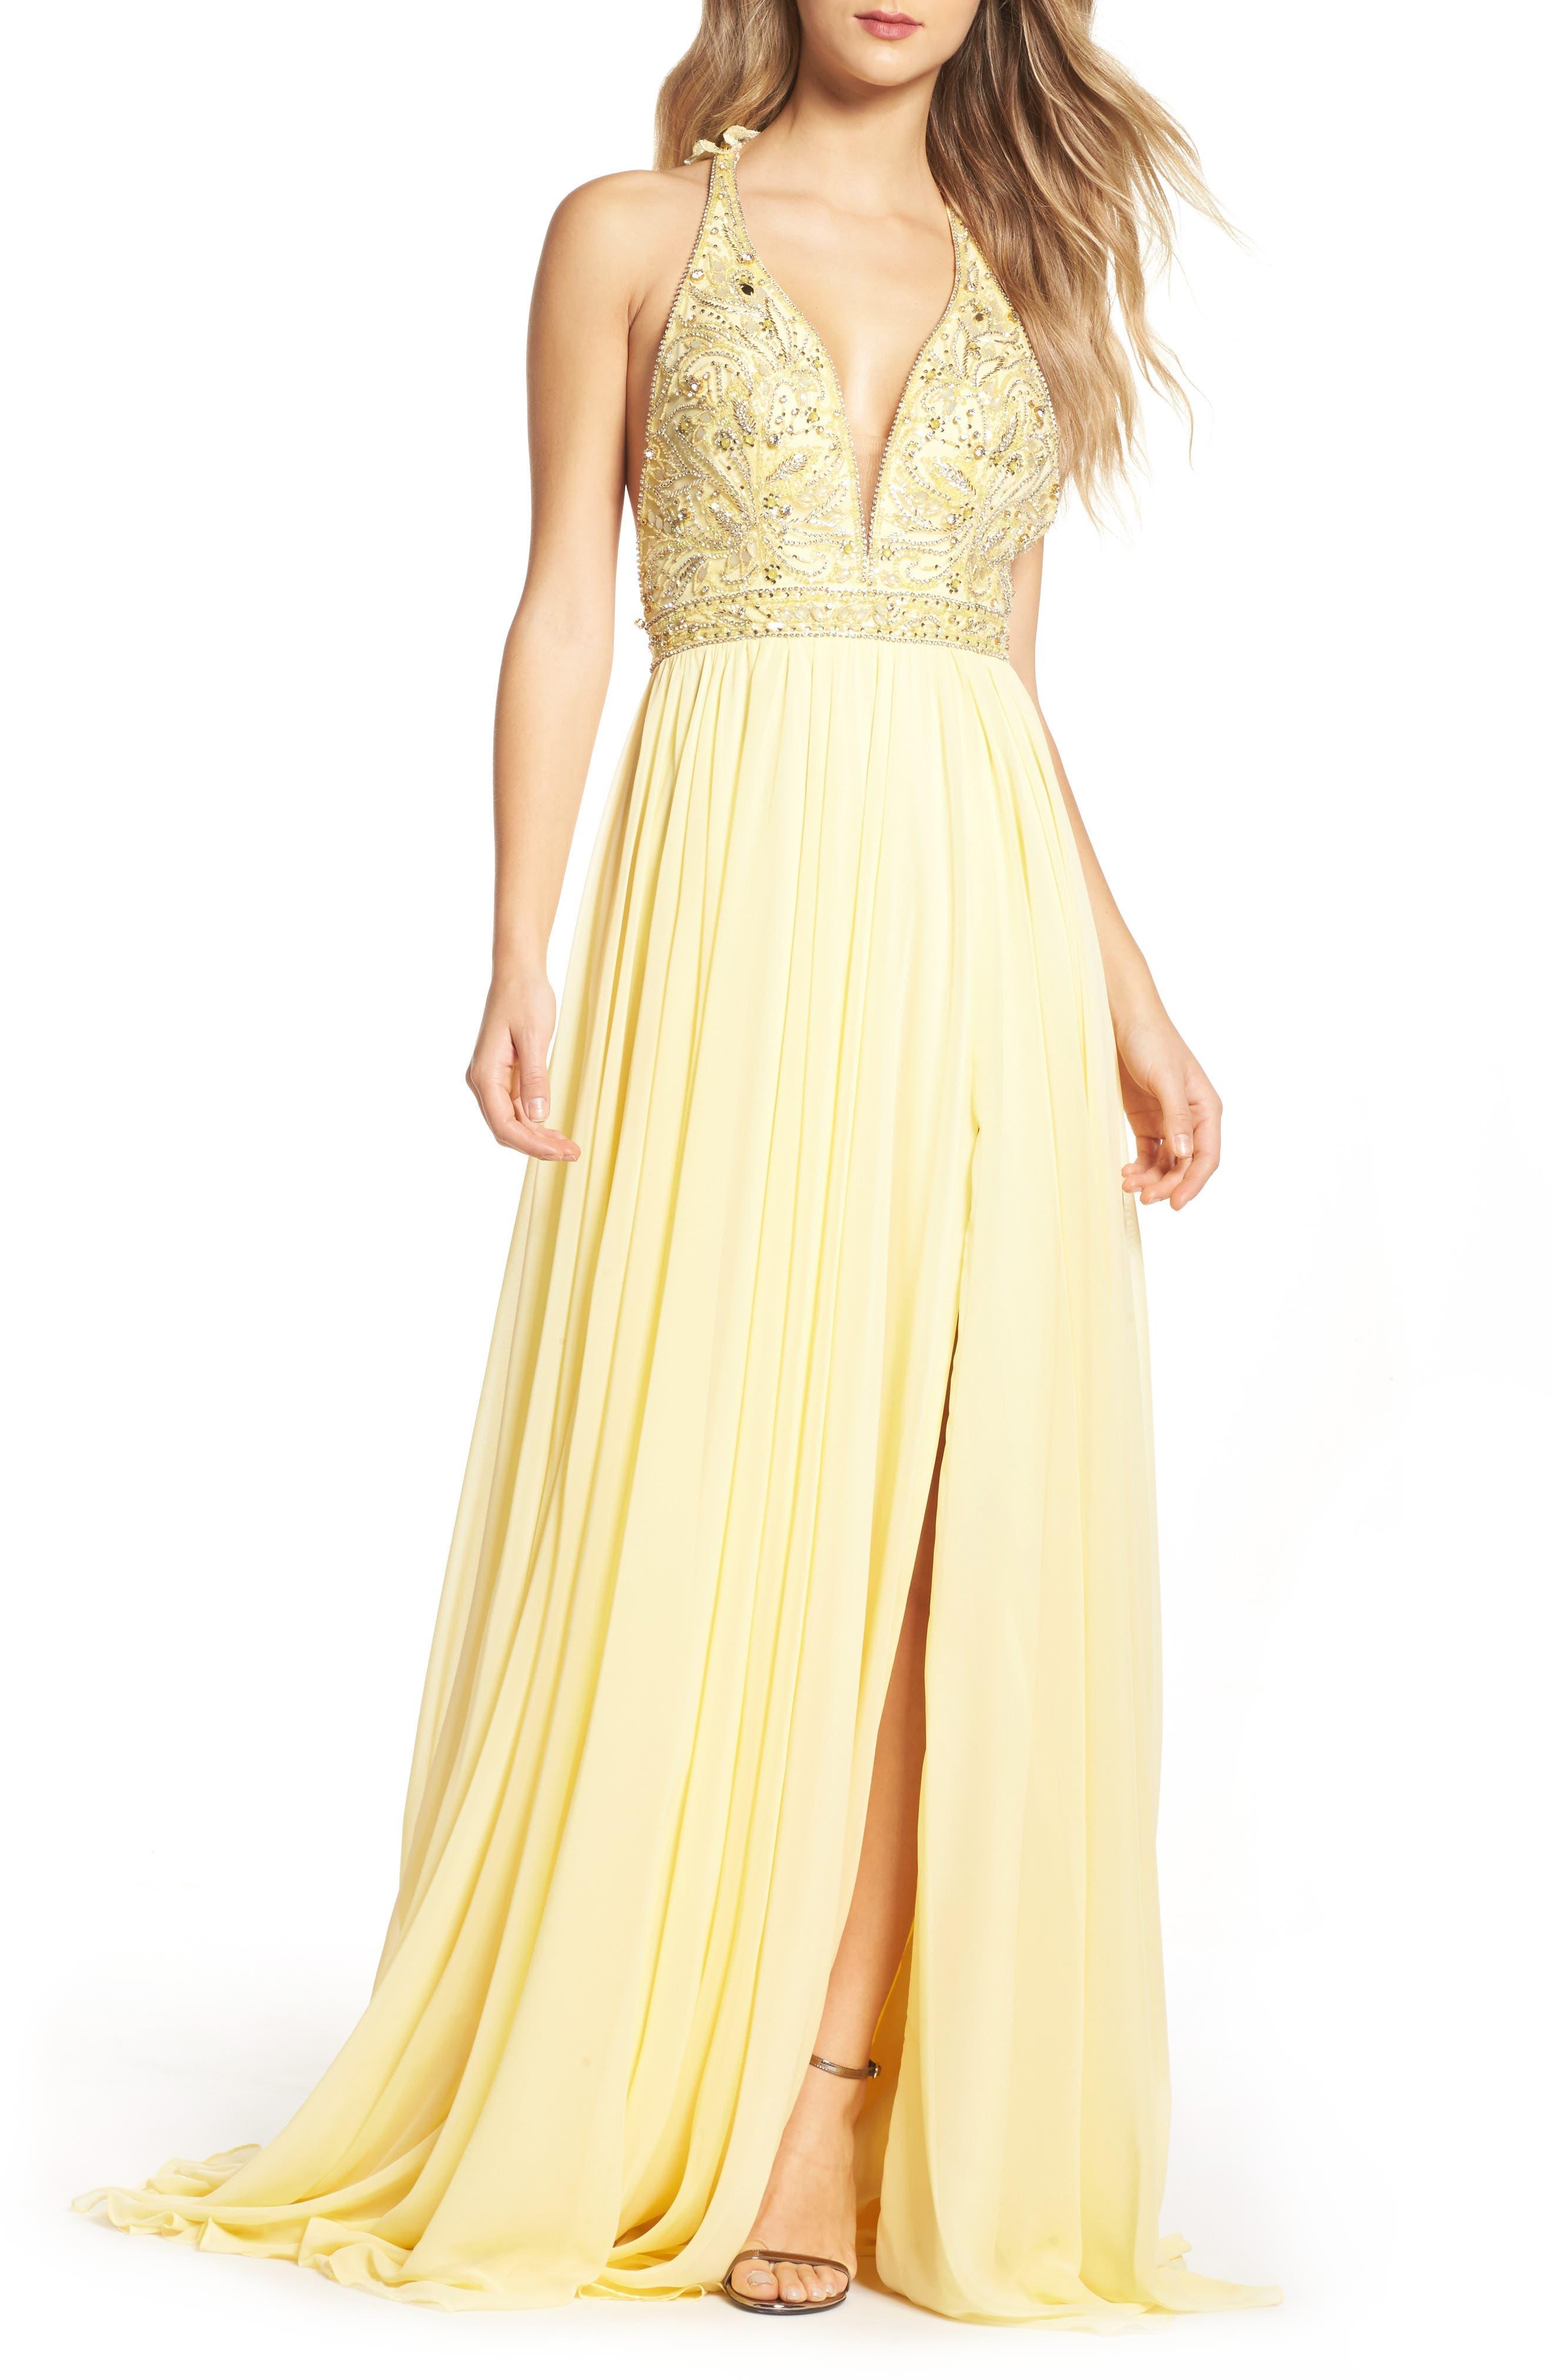 Main Image - Mac Duggal Beaded Halter Neck Gown